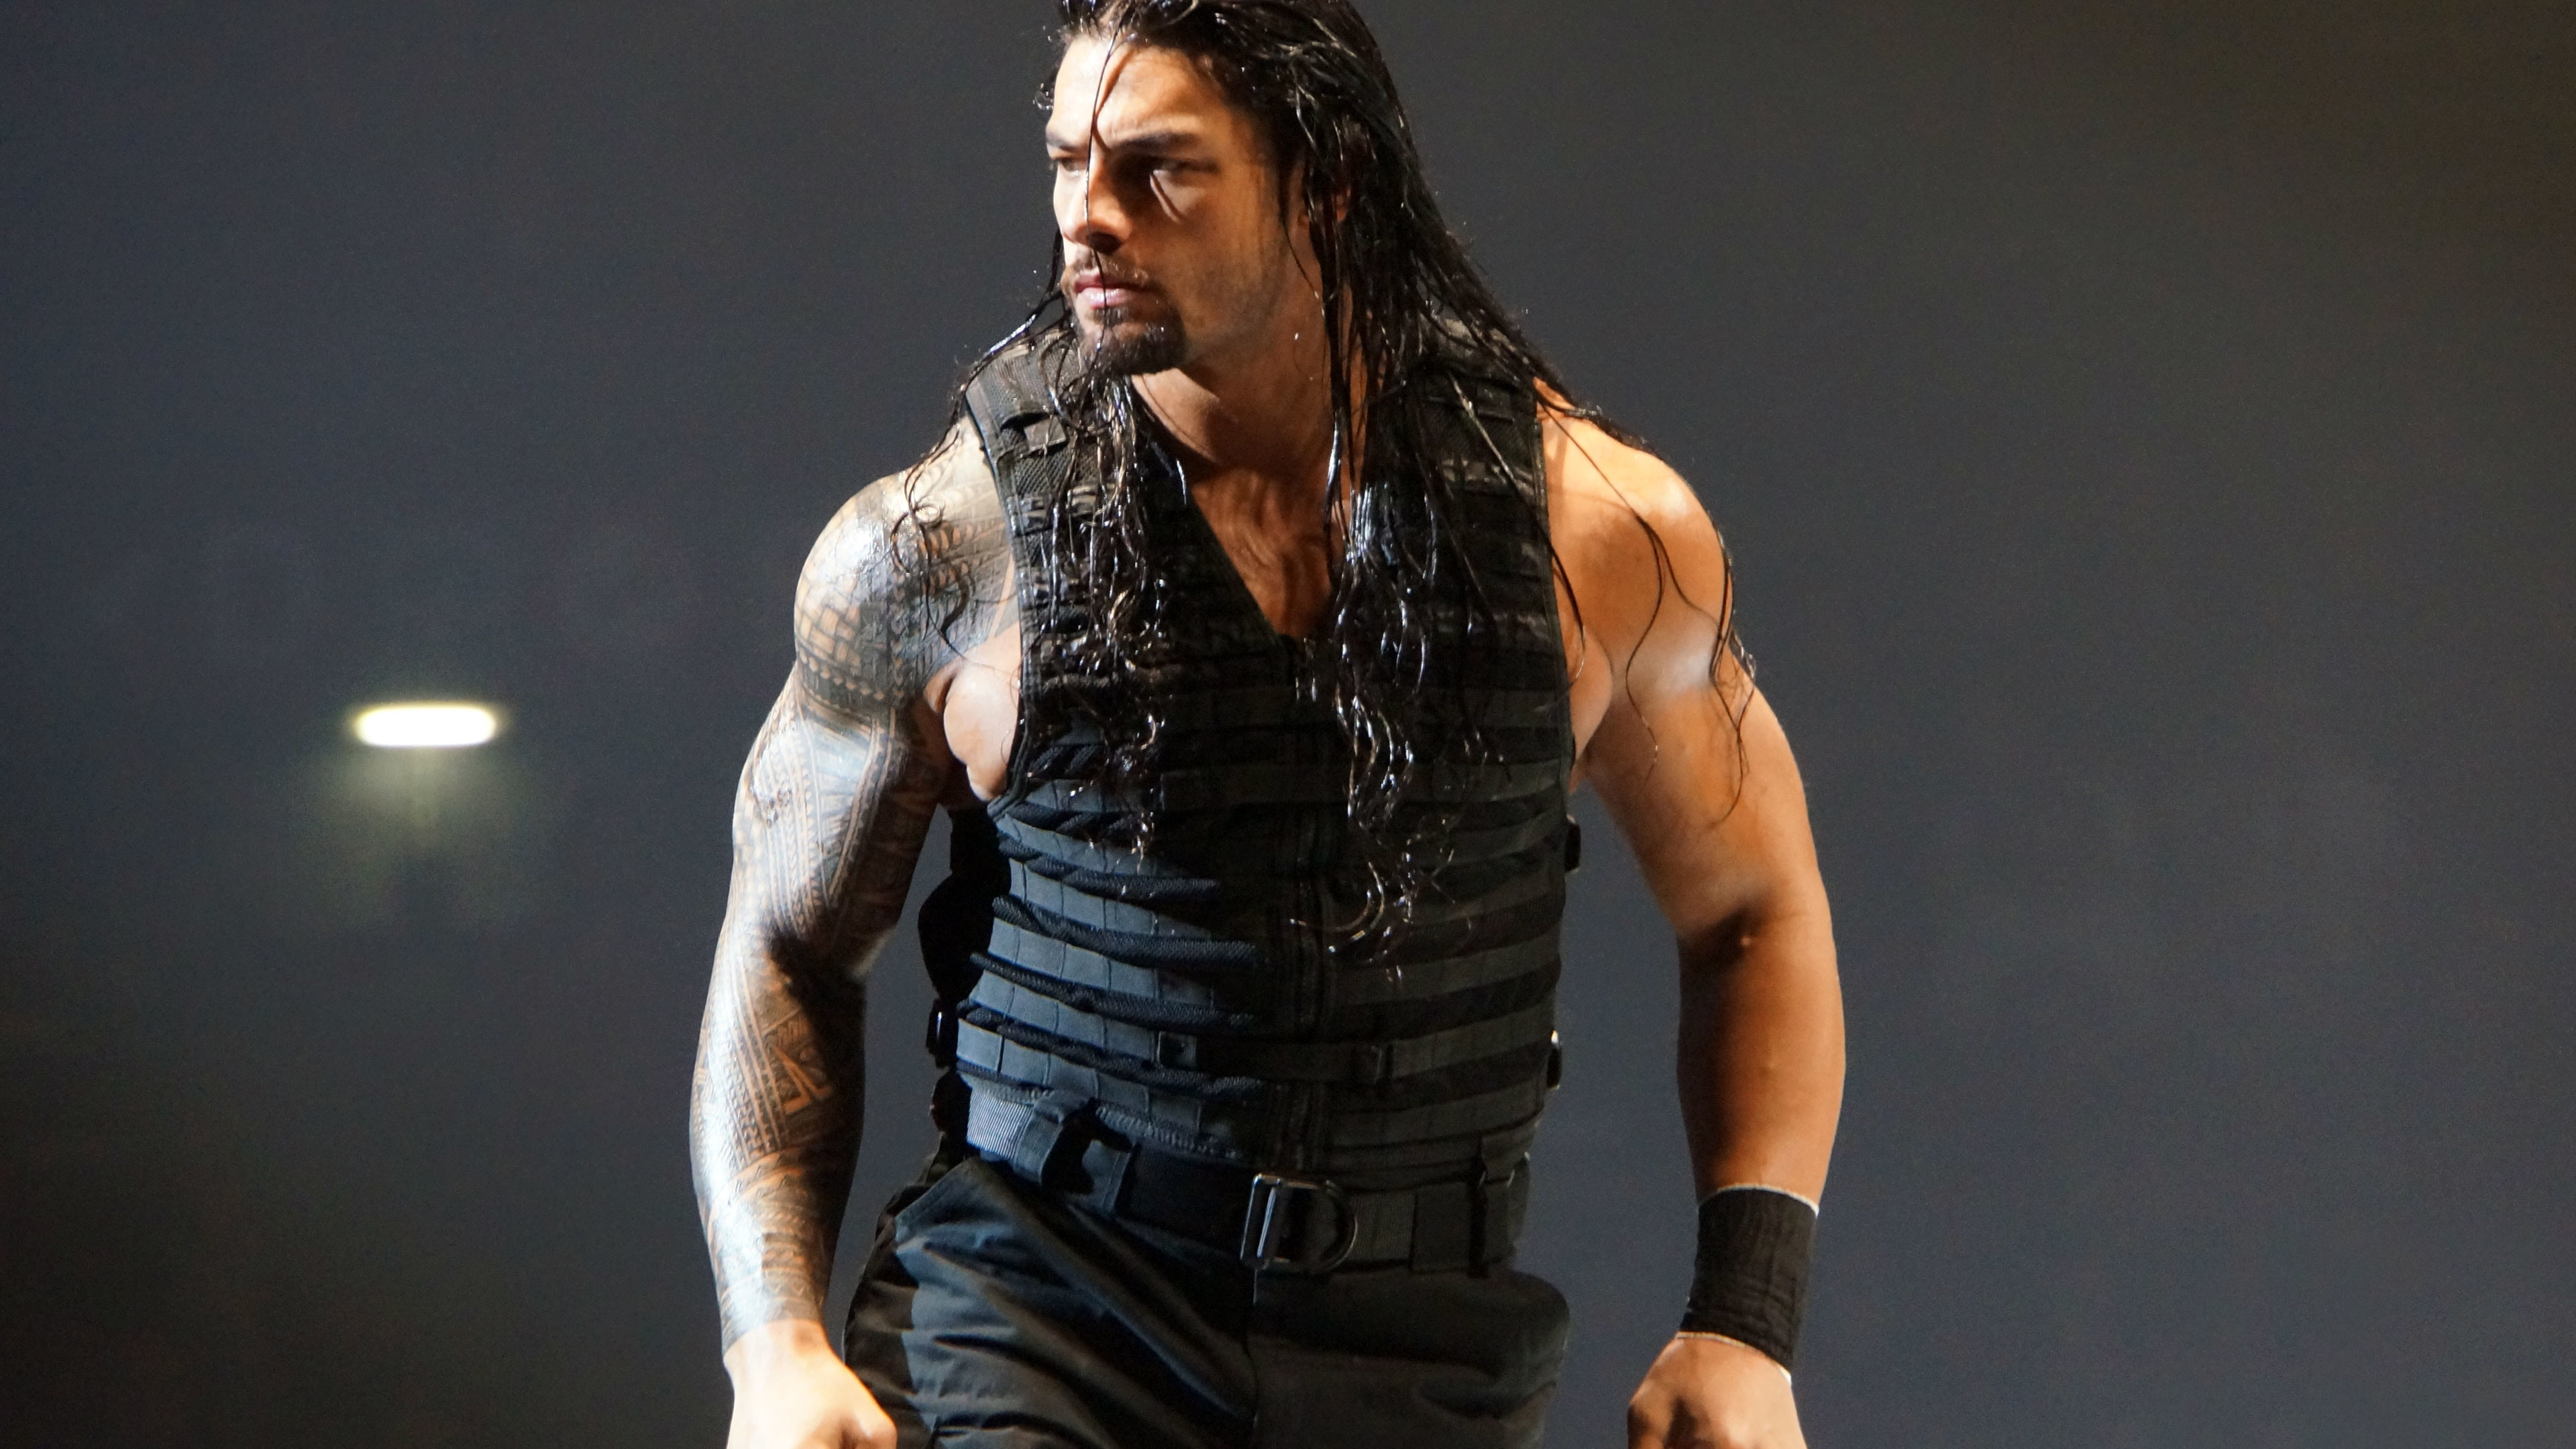 Roman Reigns WWE 4K wallpaper